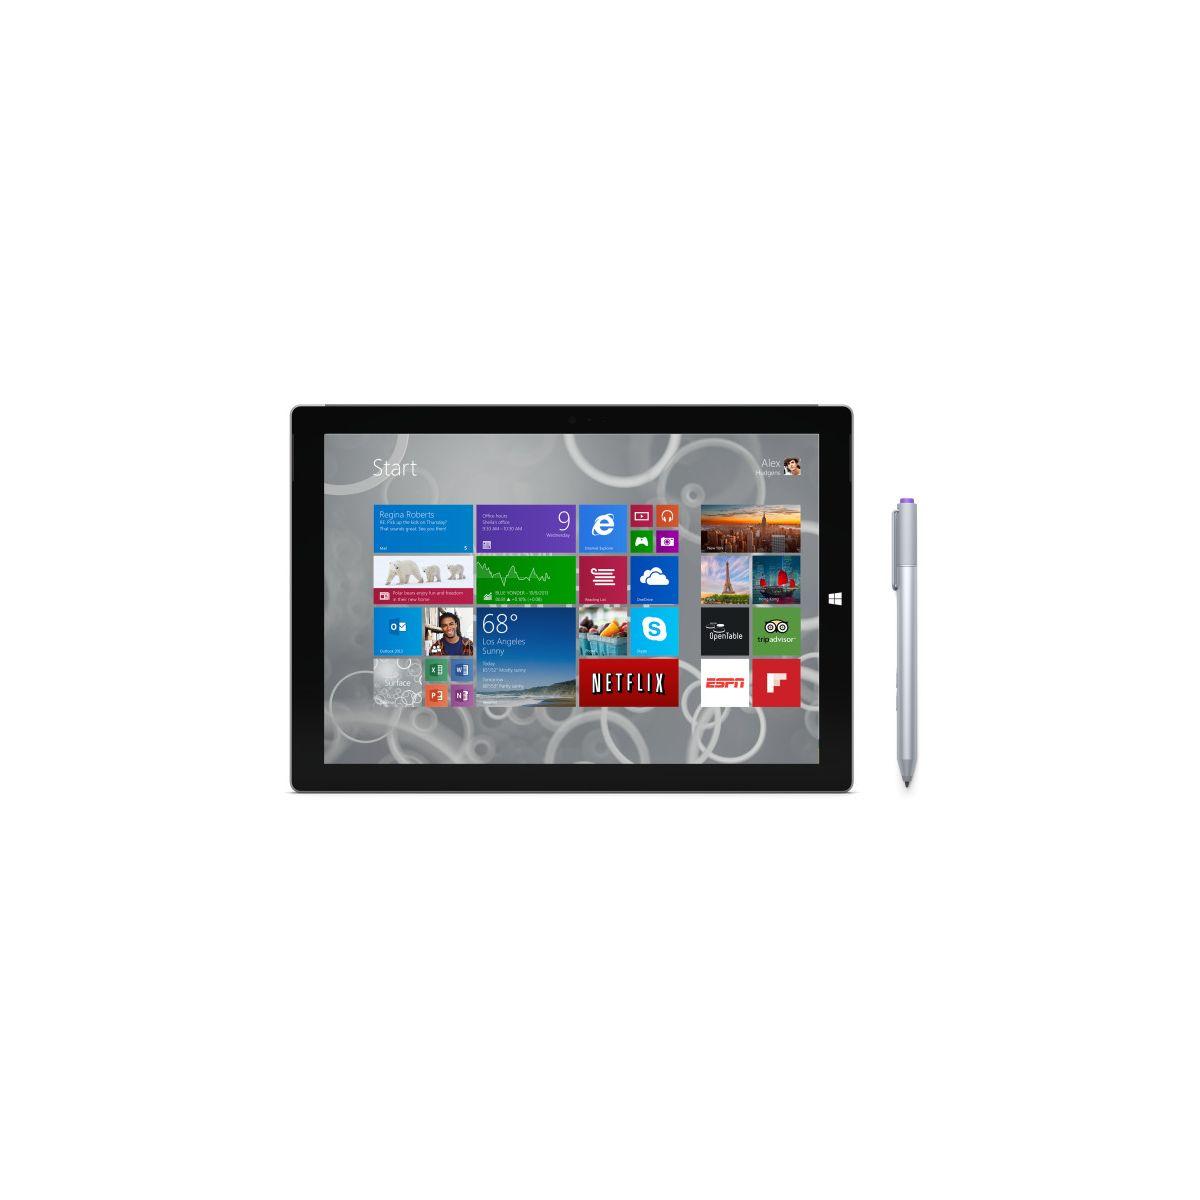 microsoft surface pro 3 128 go core i5 tablette tactile 12 sous windows 8 1 10 pro. Black Bedroom Furniture Sets. Home Design Ideas